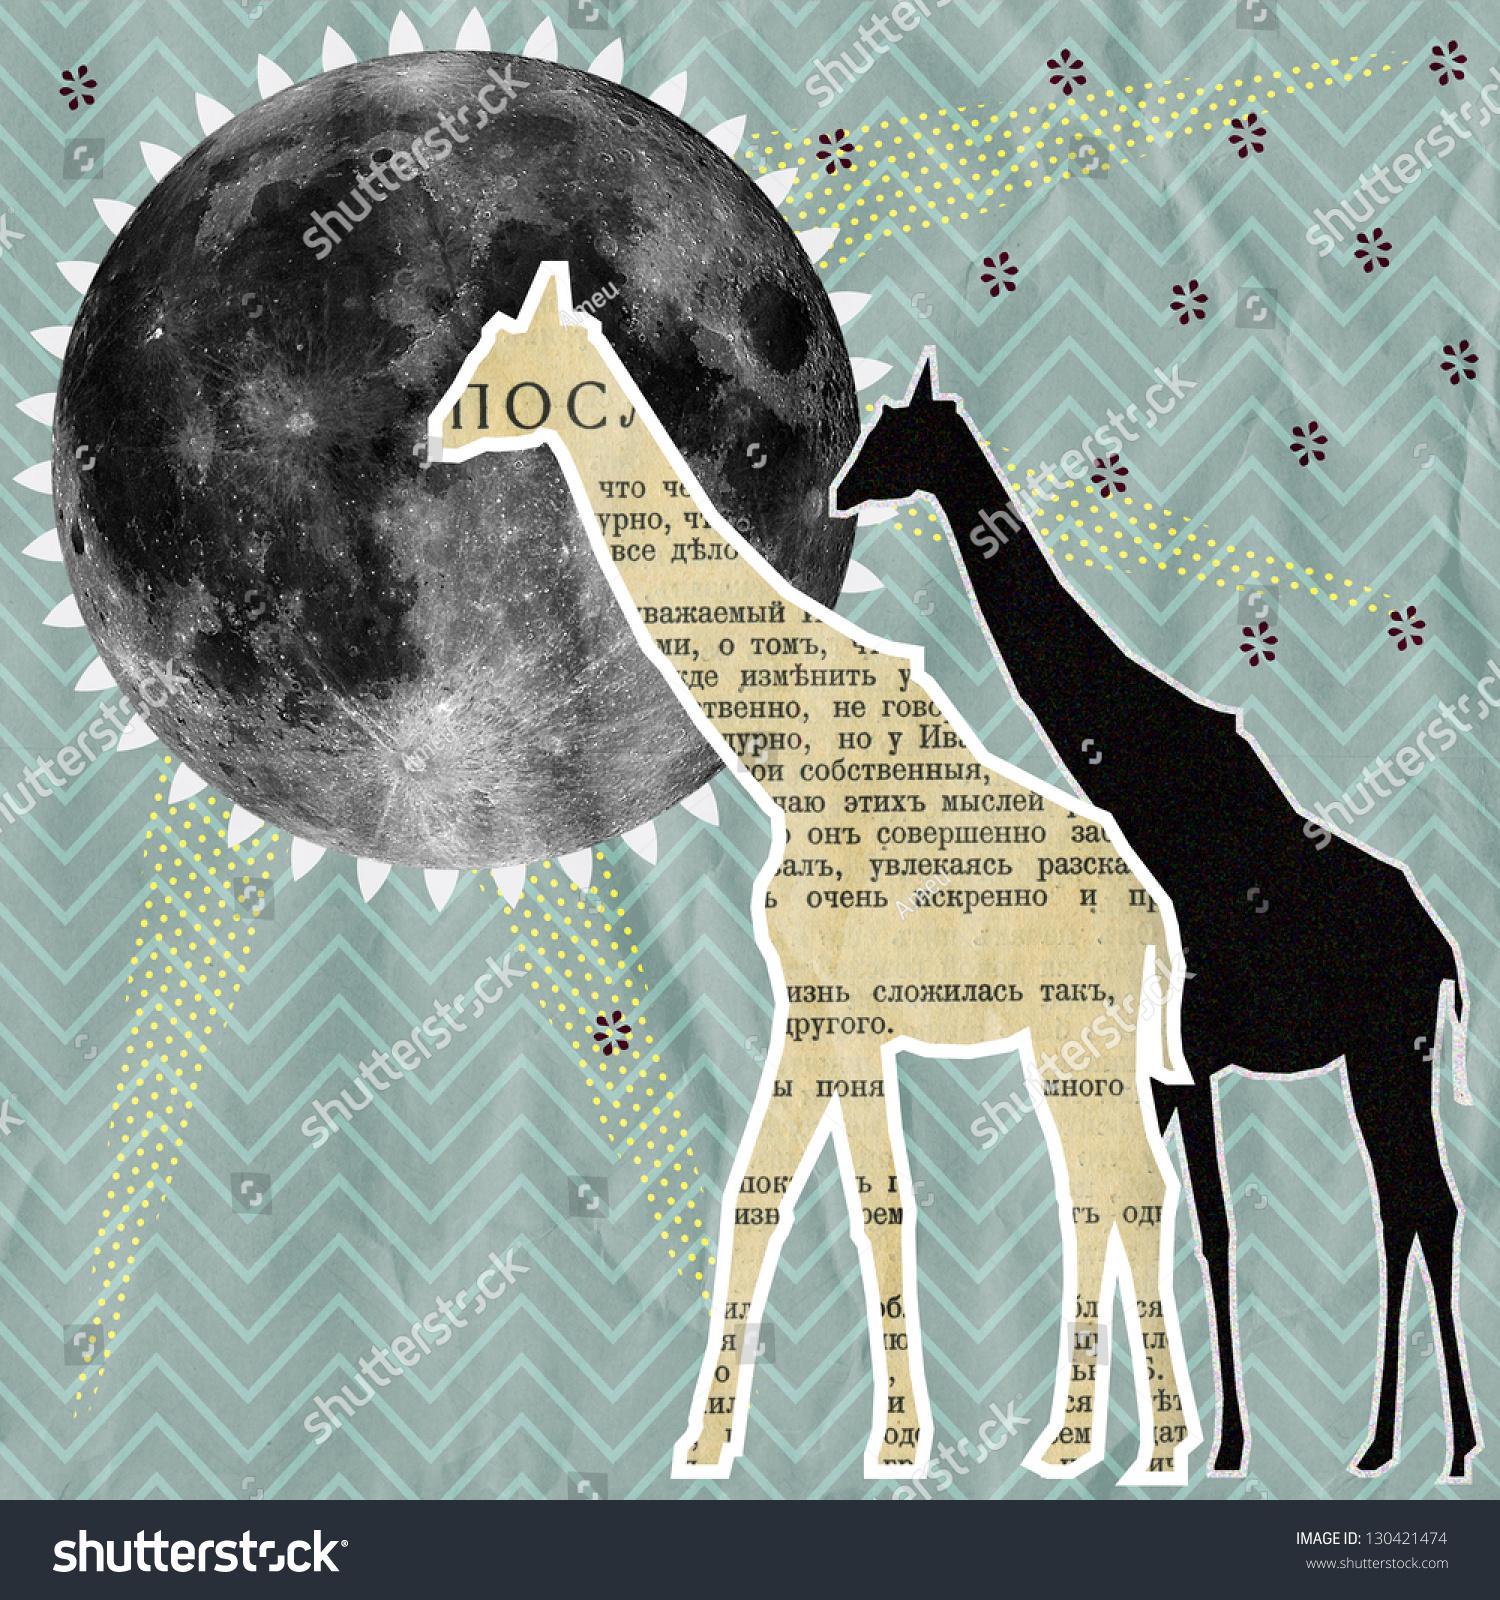 Unusual Template Collage Illustration Giraffes Moon Stock ...